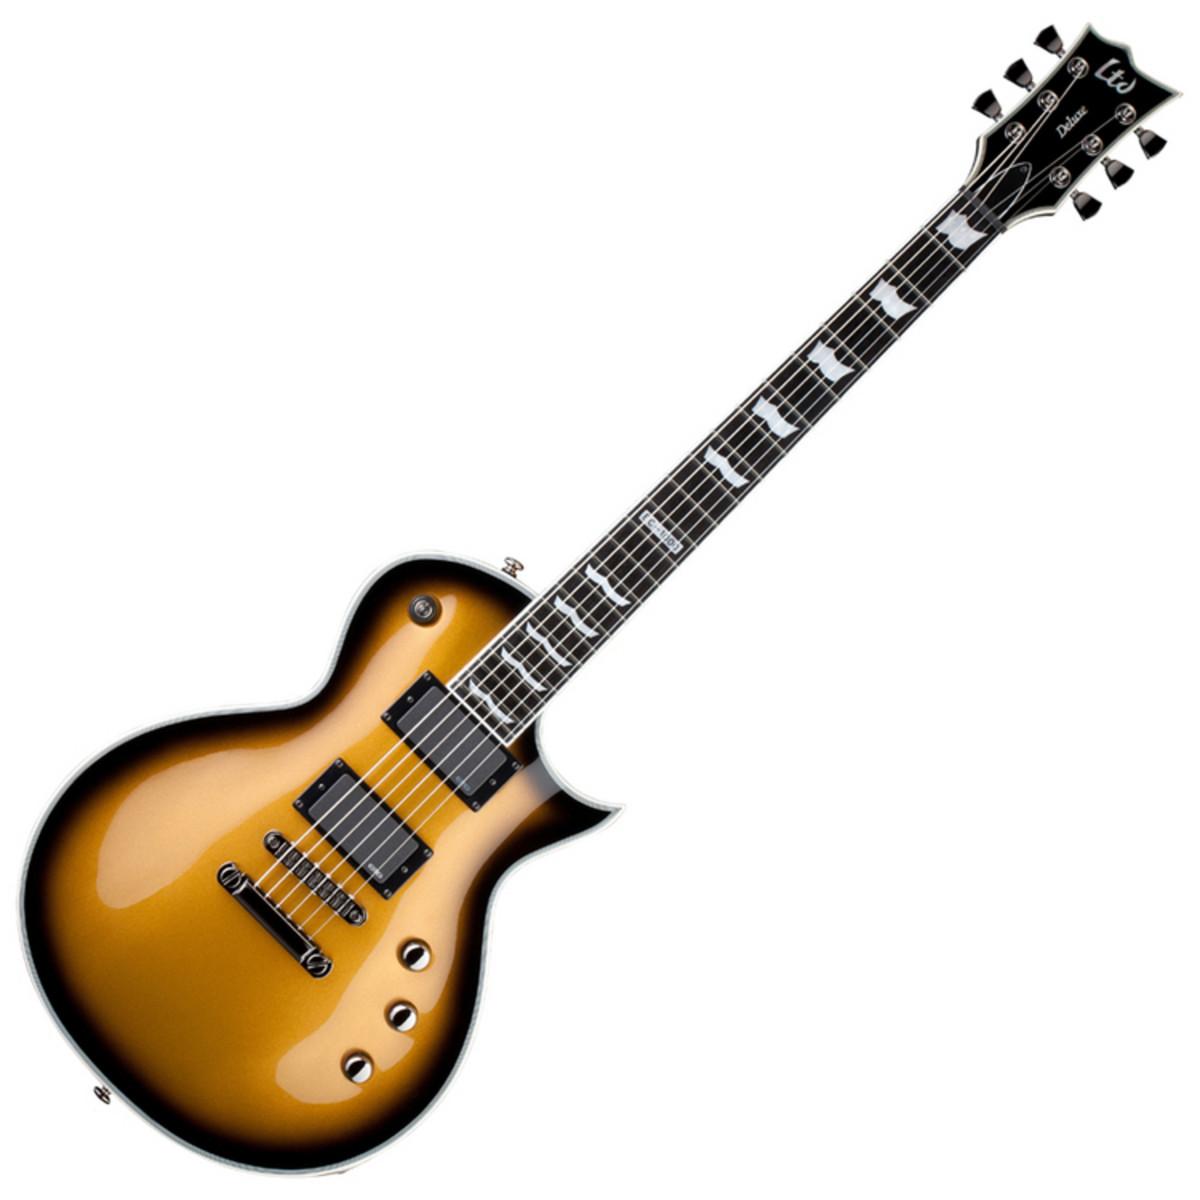 esp ltd ec 1000 guitar metallic gold sunburst at. Black Bedroom Furniture Sets. Home Design Ideas